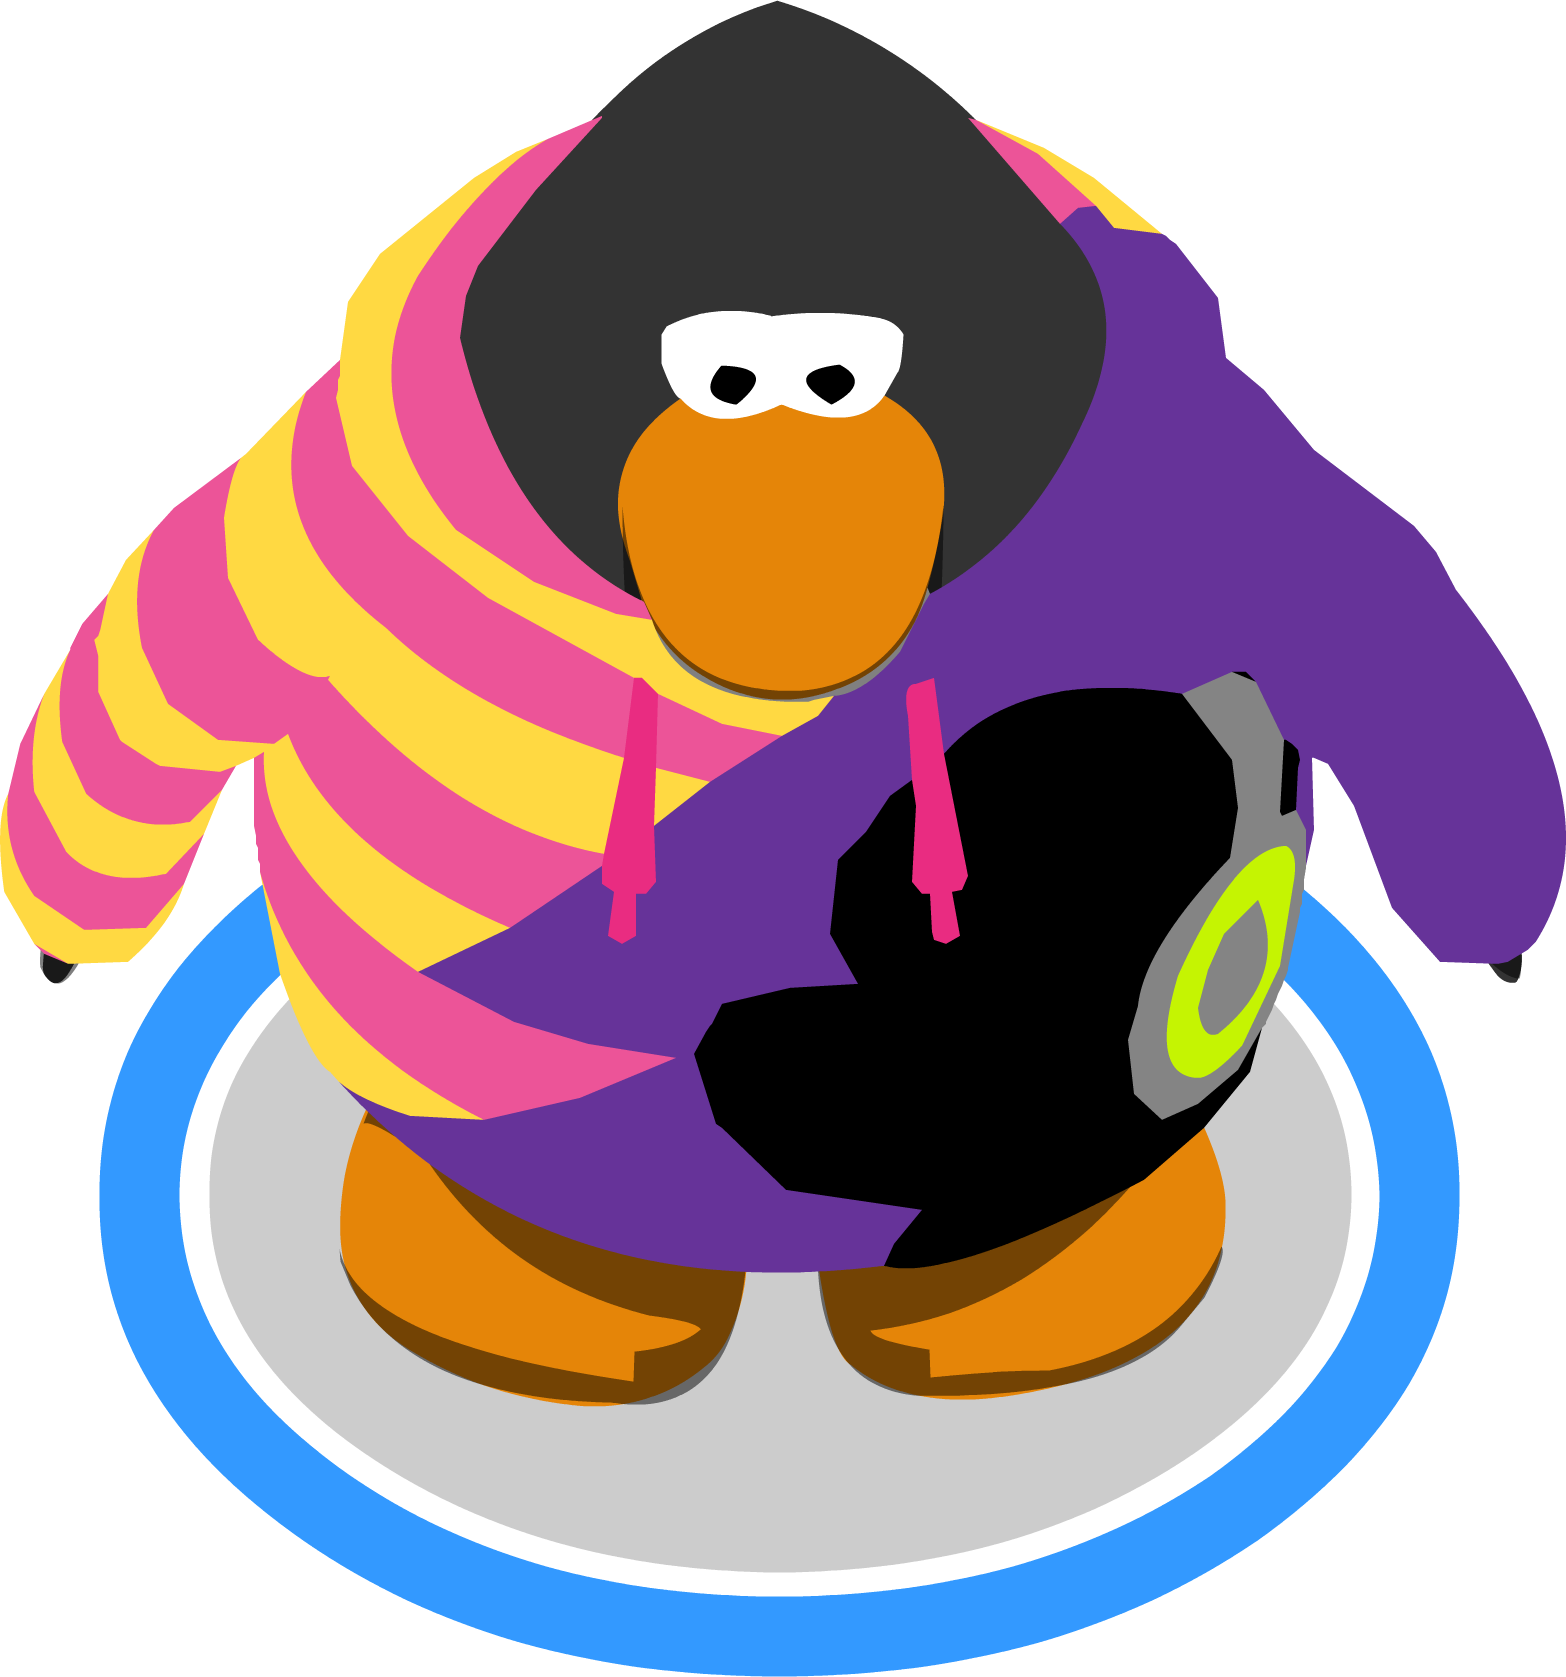 Purple clipart gorilla. Image dj cadence hoodie